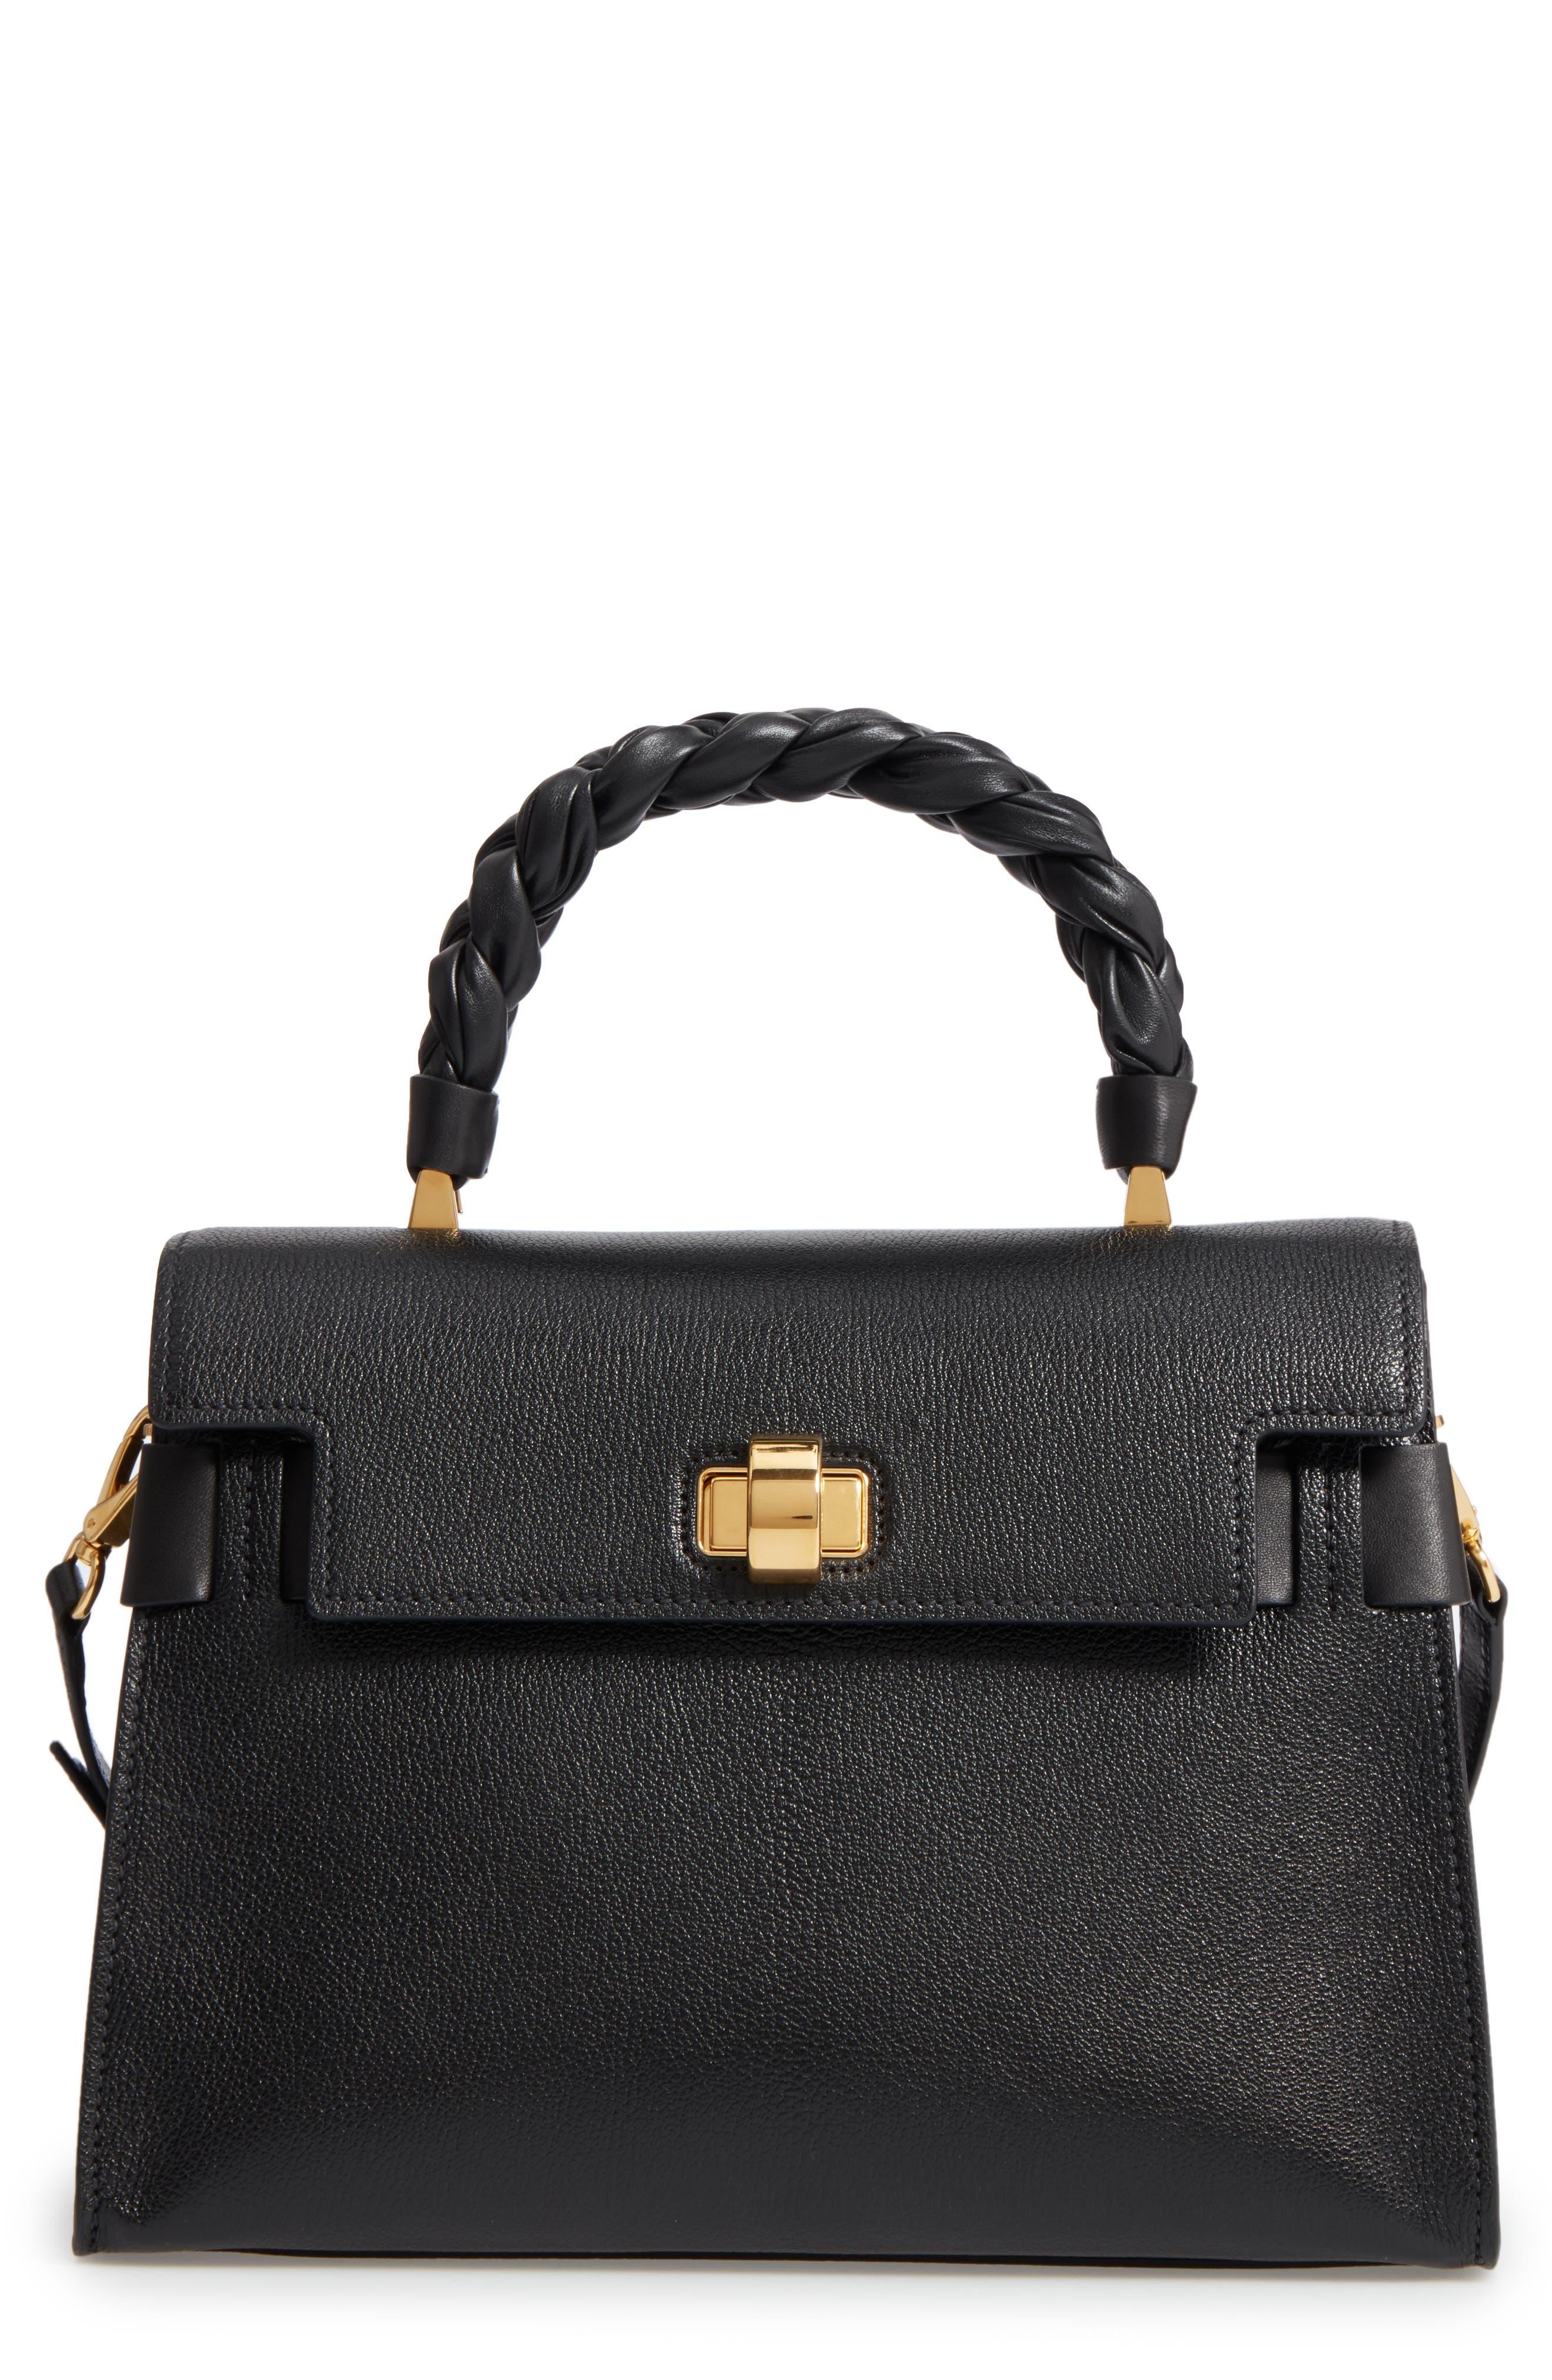 Madras Click Goatskin Leather Satchel,                             Main thumbnail 1, color,                             Black